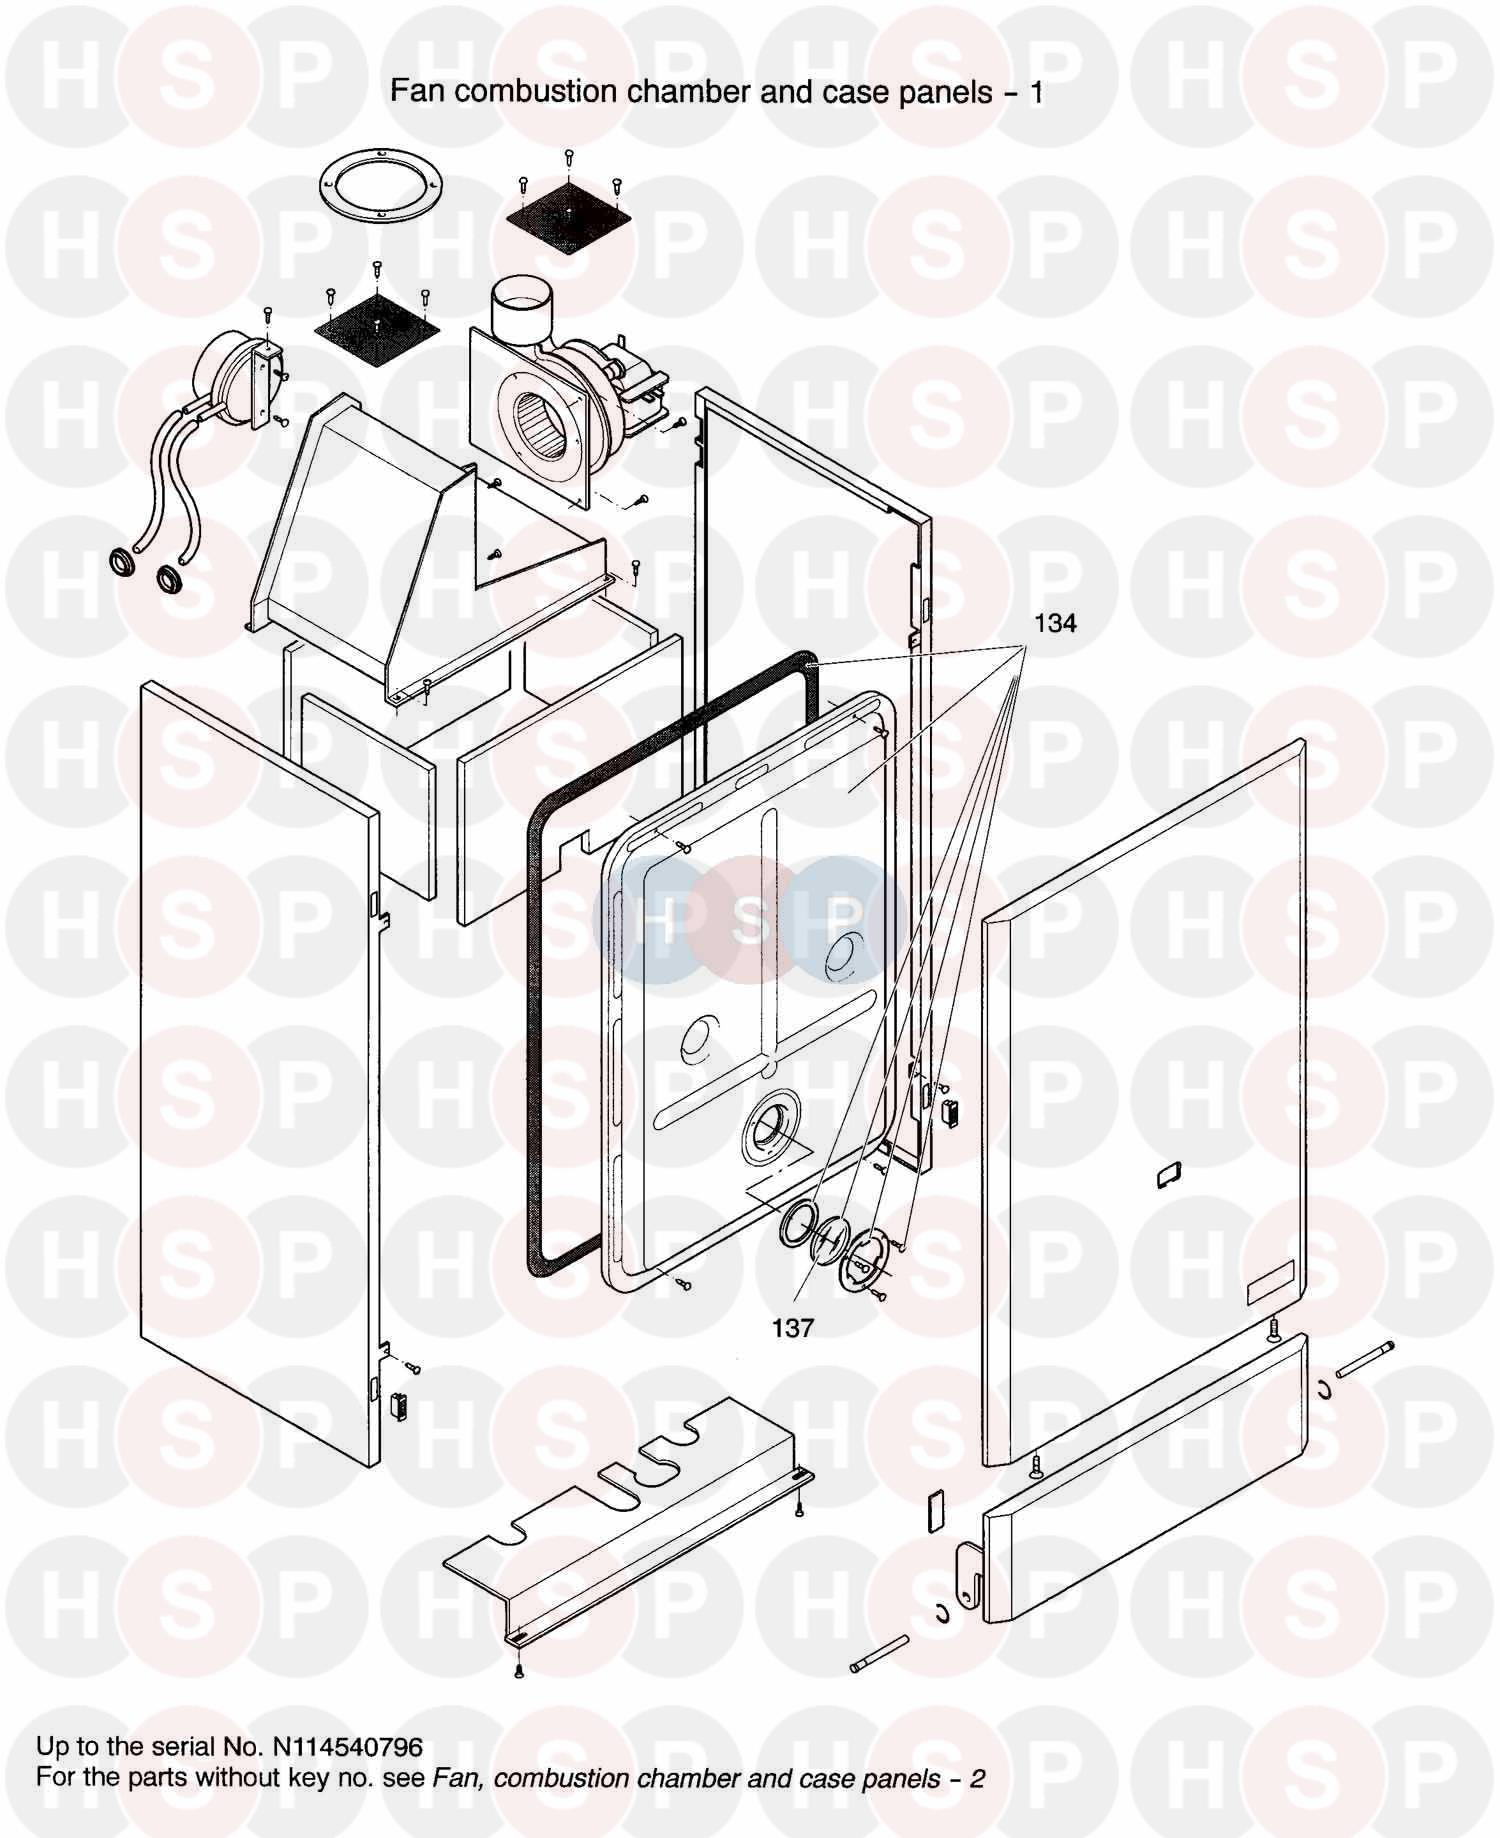 biasi prisma 24s  200 appliance diagram  fan combustion